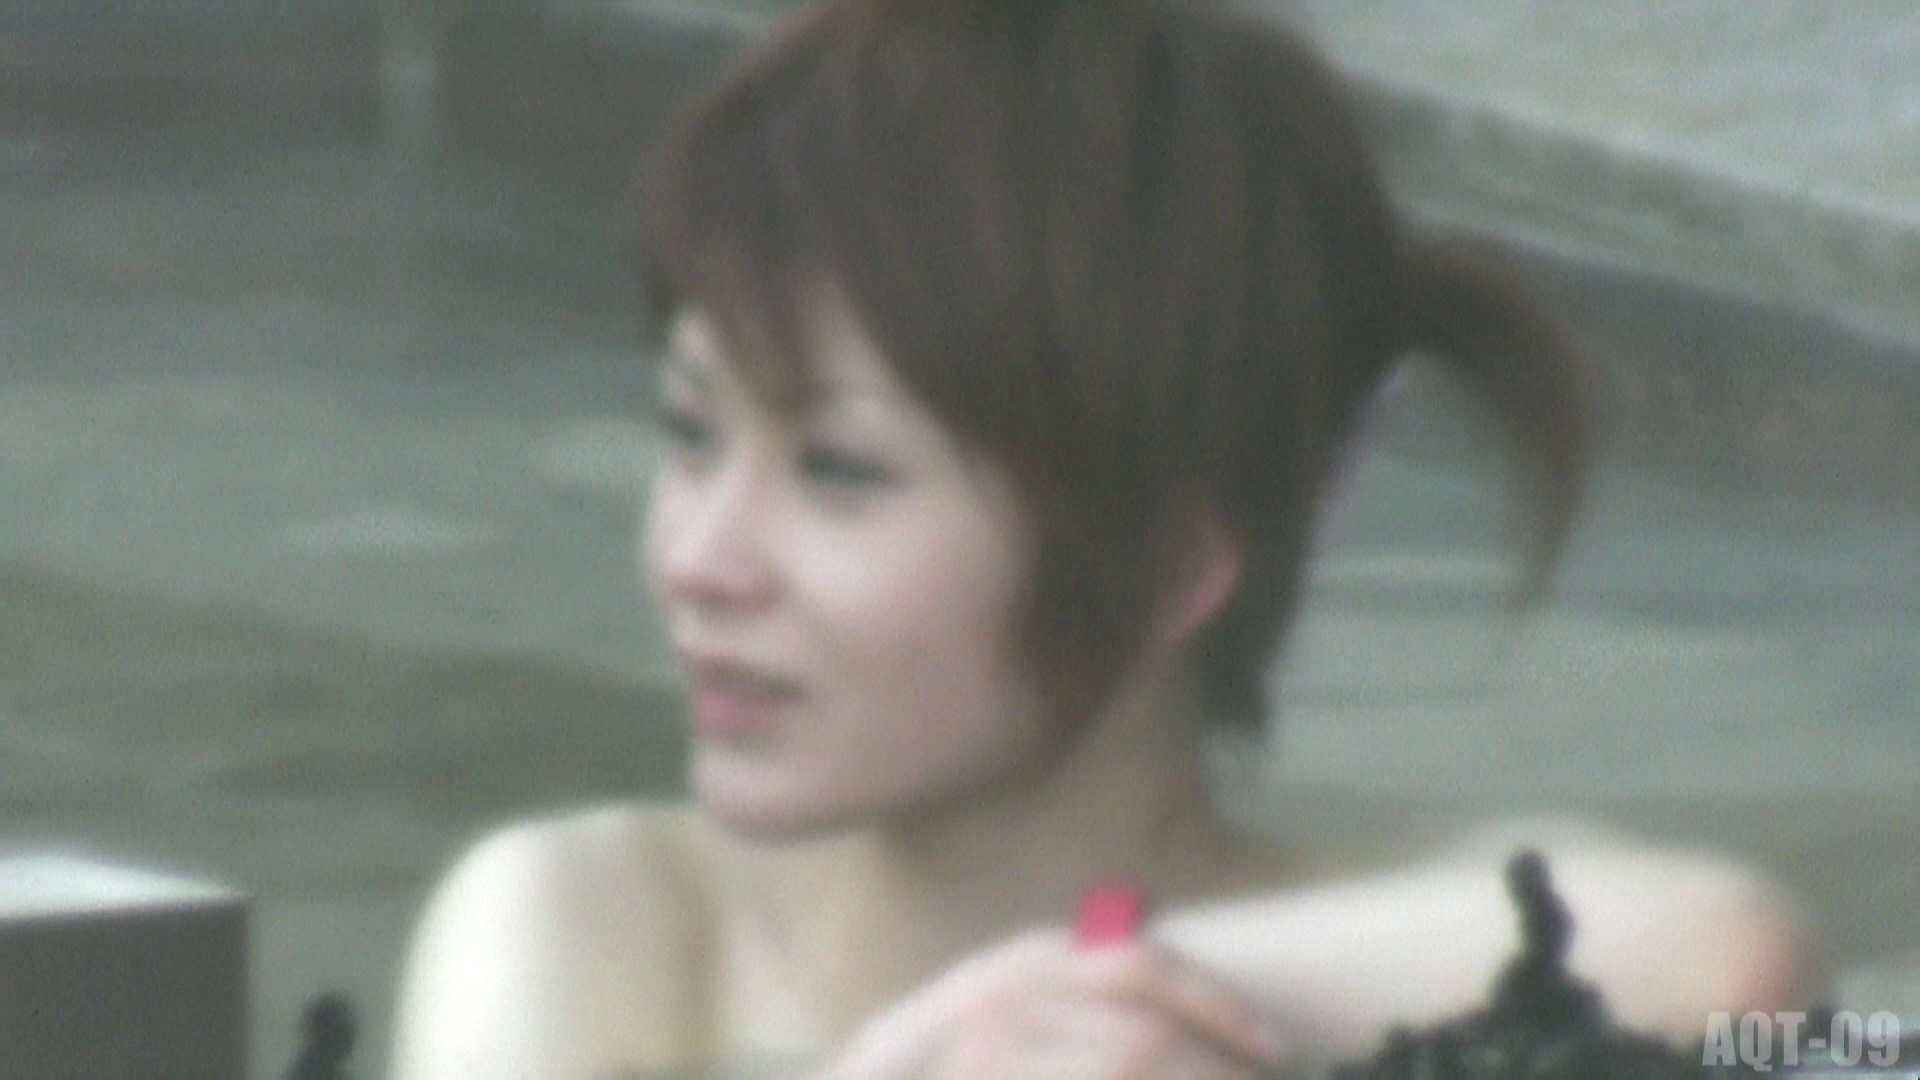 Aquaな露天風呂Vol.779 OLセックス 覗きおまんこ画像 107画像 59